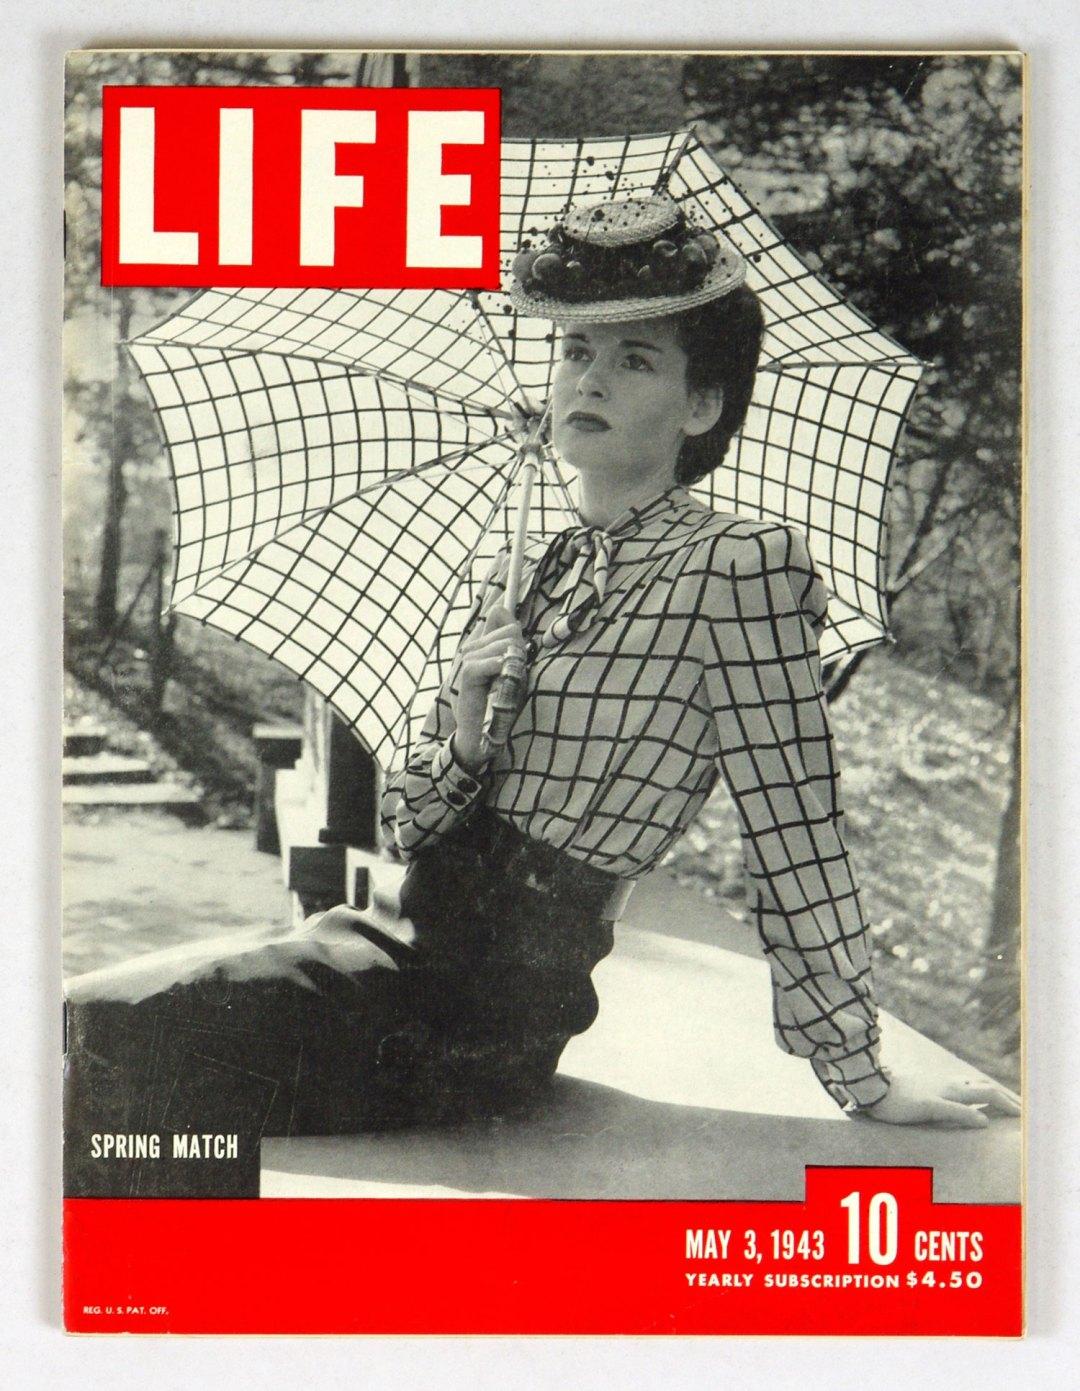 LIFE Magazine 1943 May 3 Spring Match